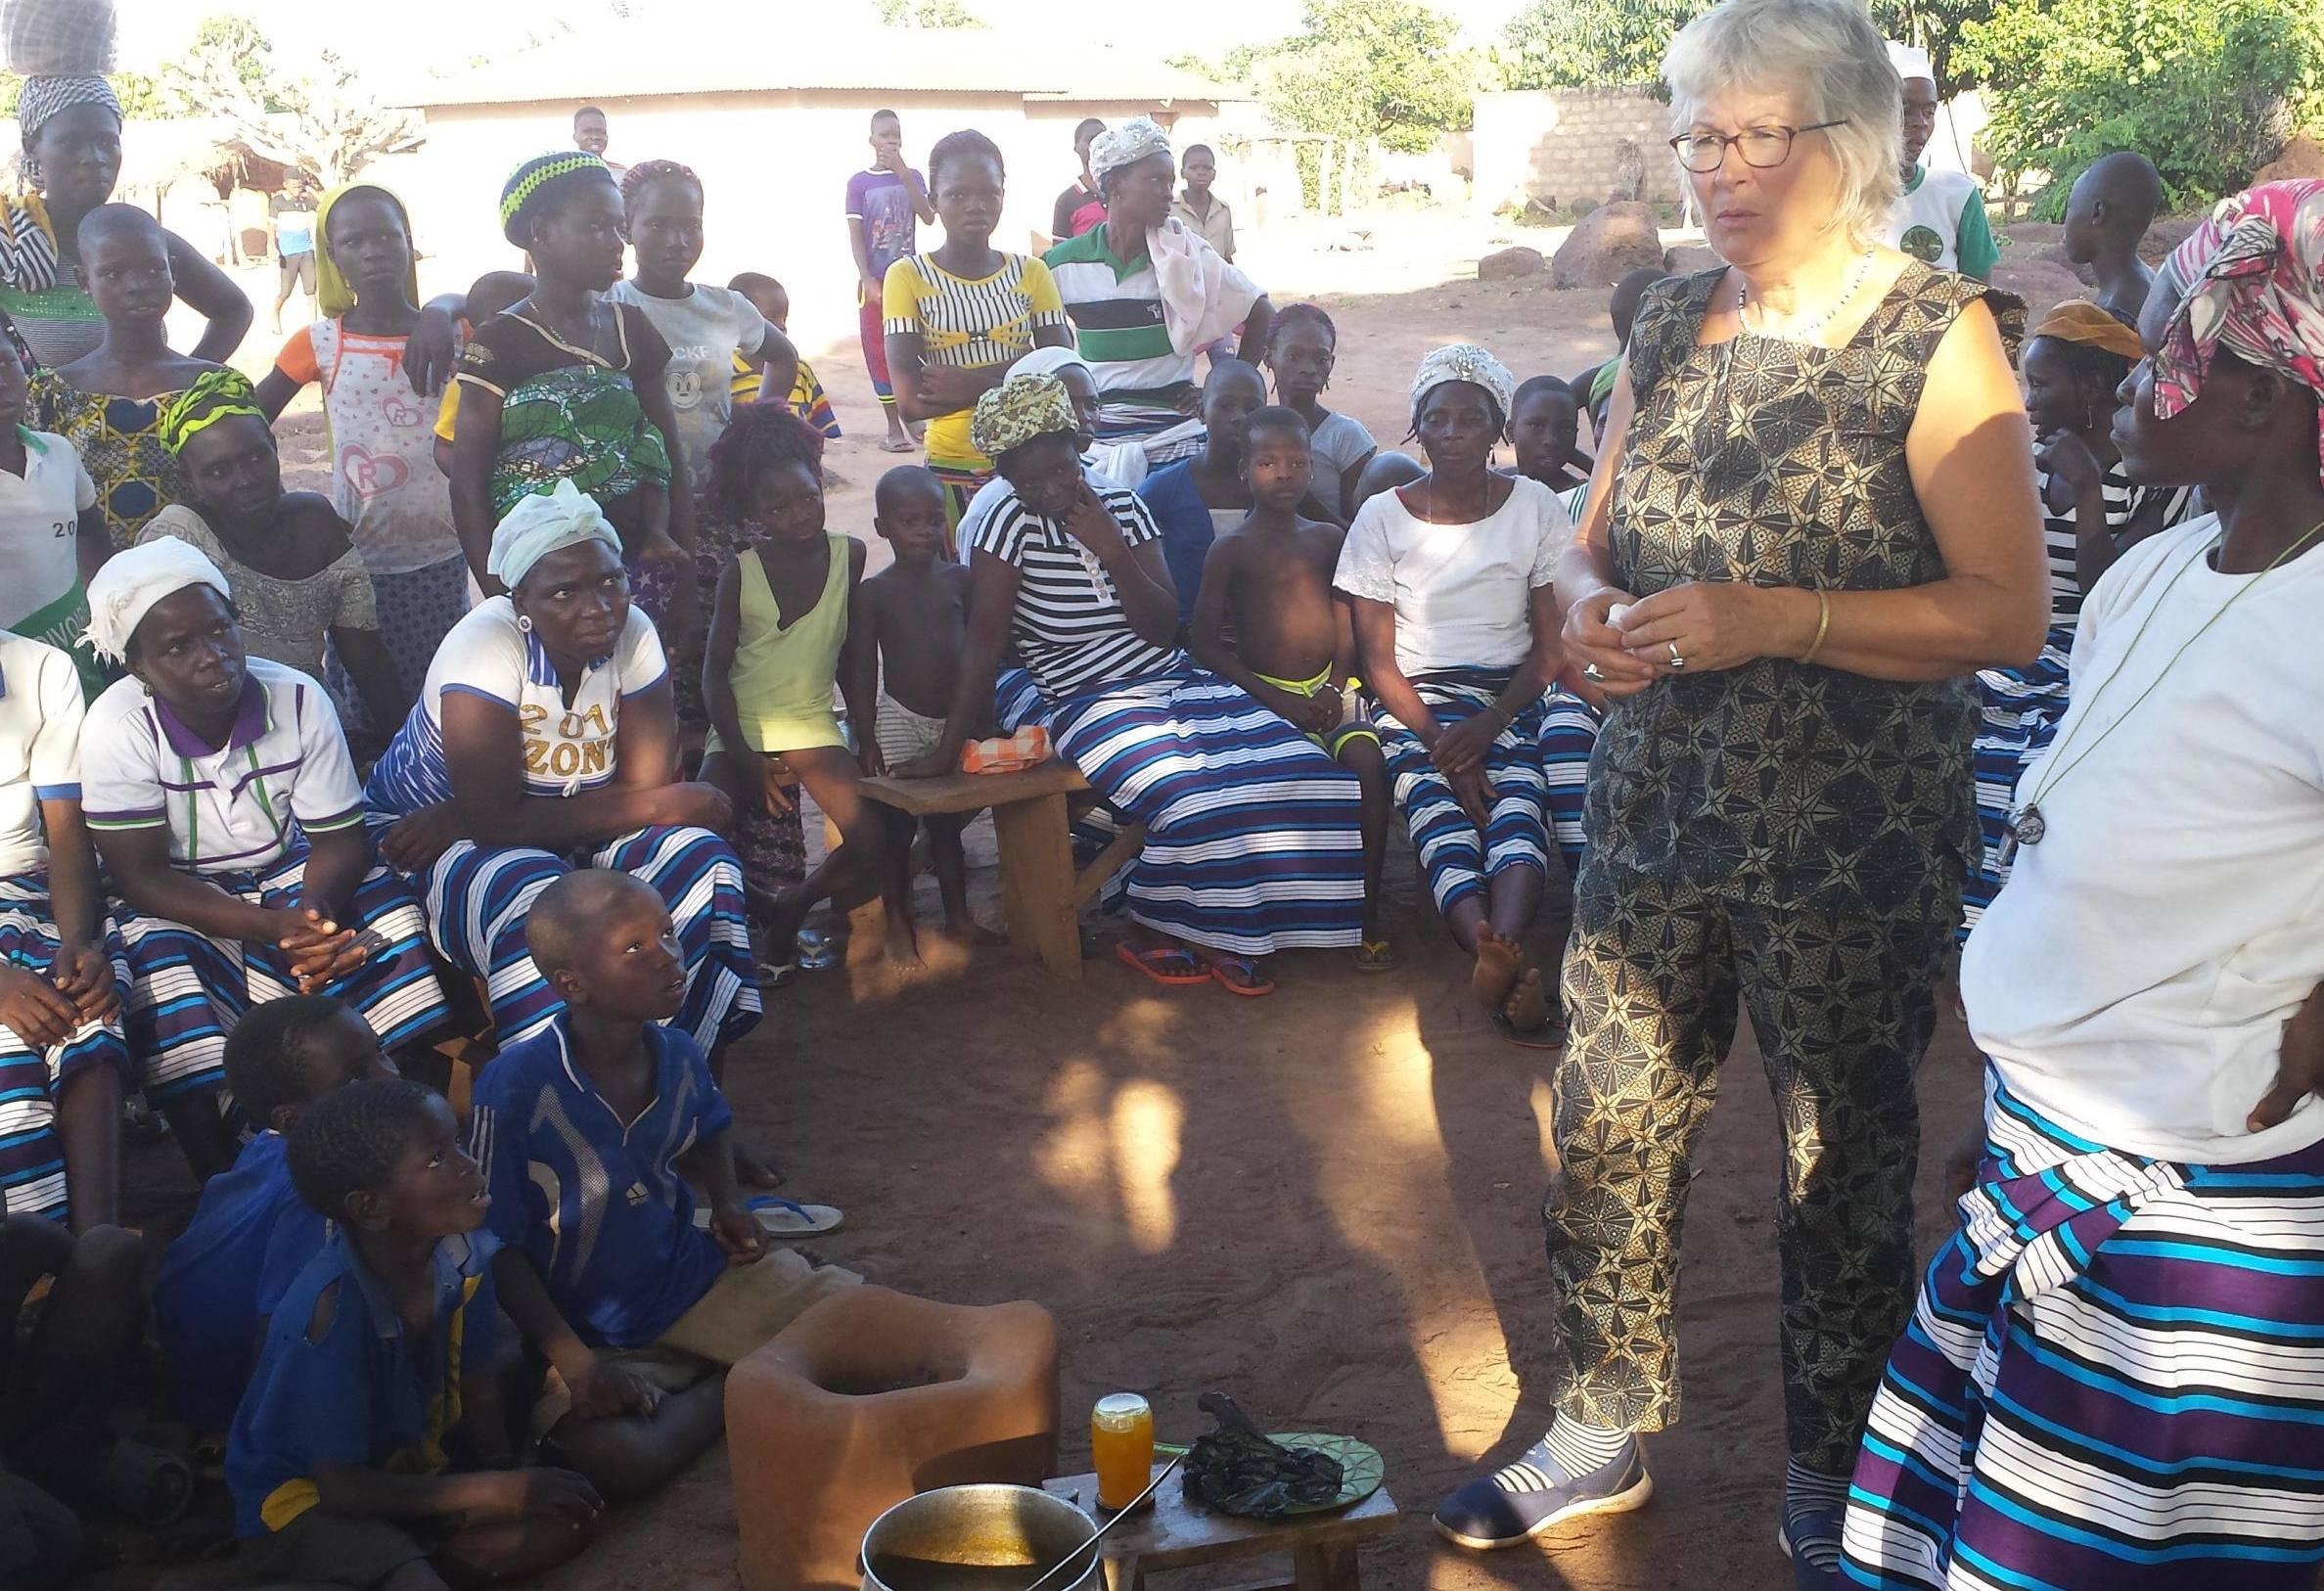 rencontres togolaises rencontres femmes celibataires longwy